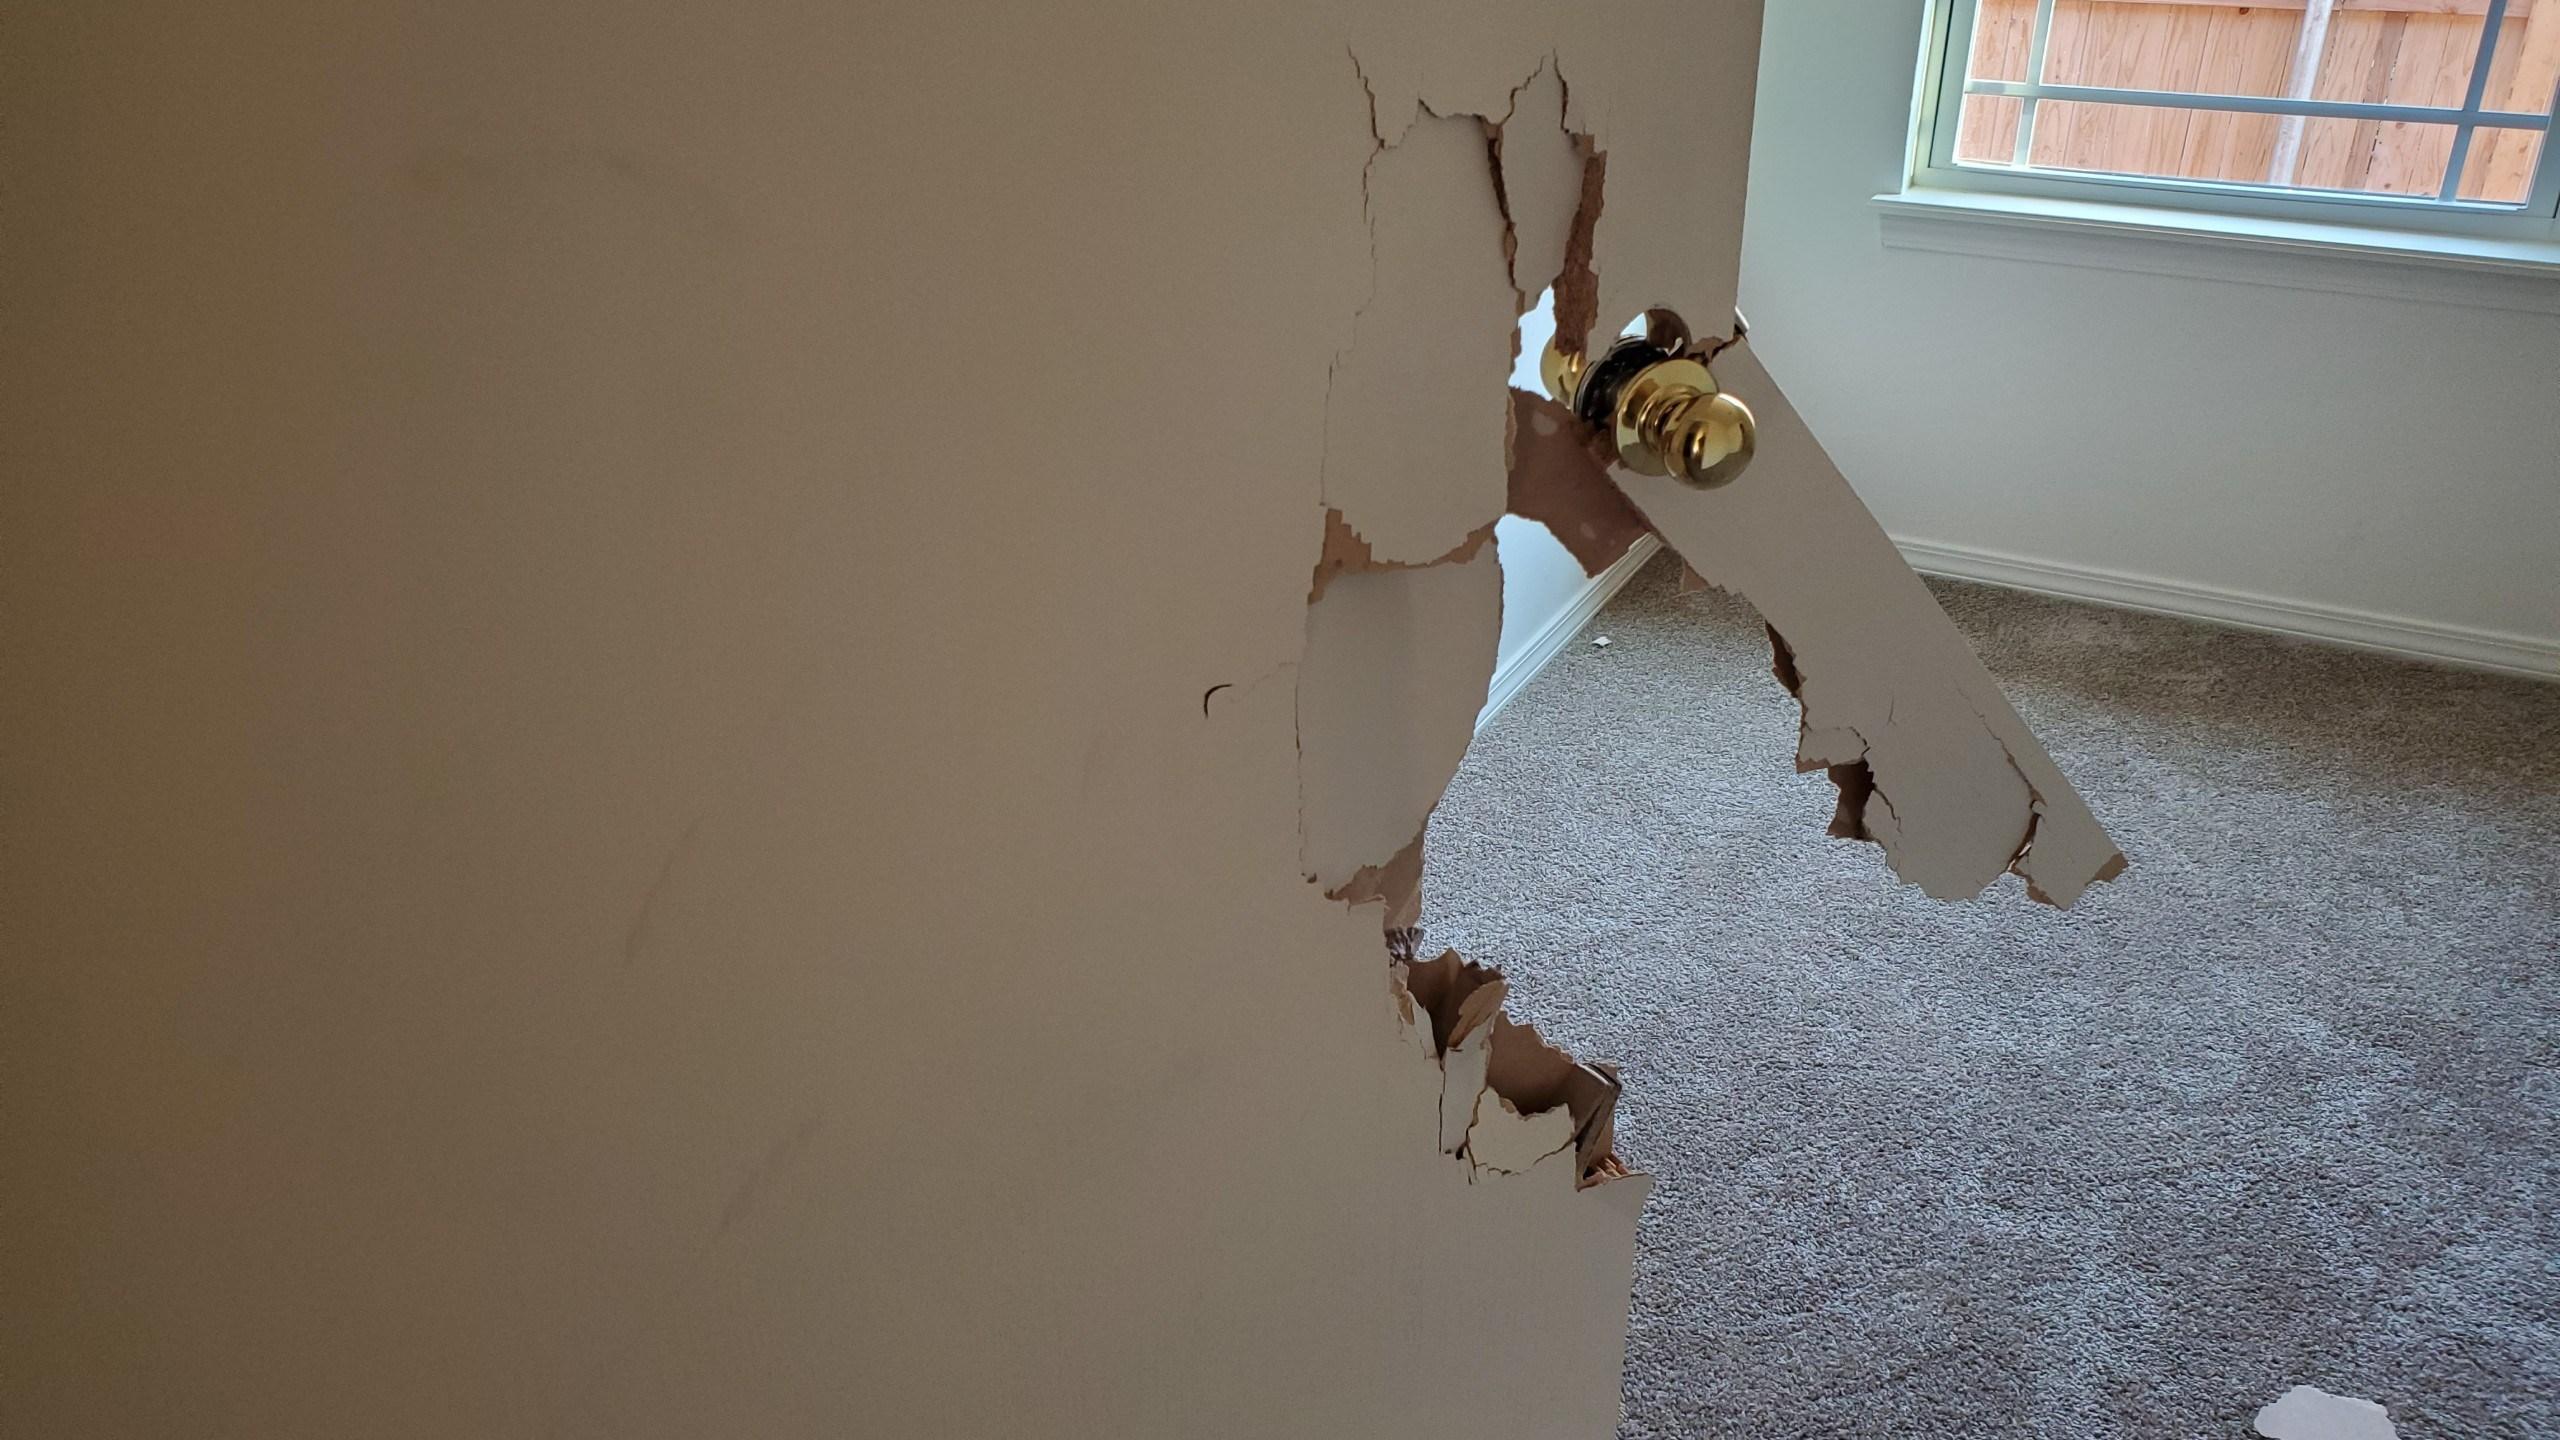 Vandals damage home